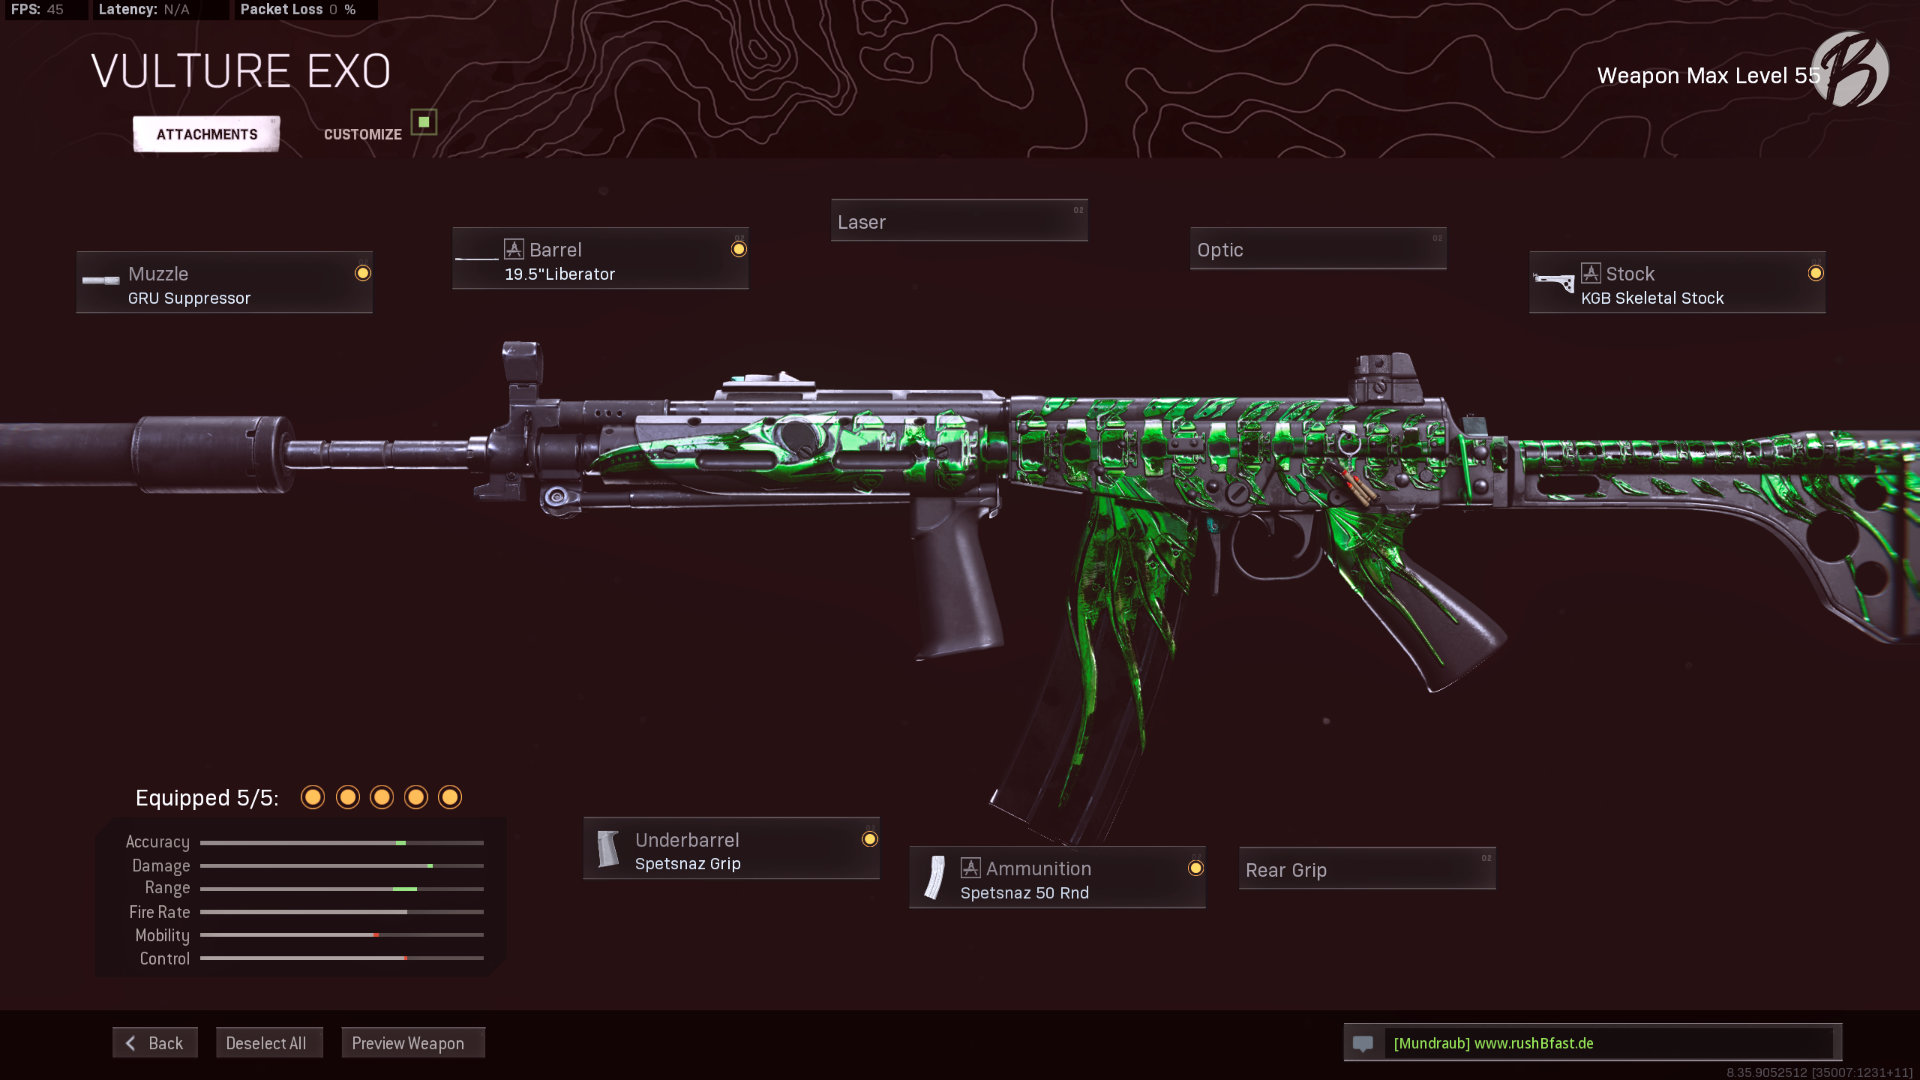 Call of Duty Warzone - Cold War Season 3 - FARA 83